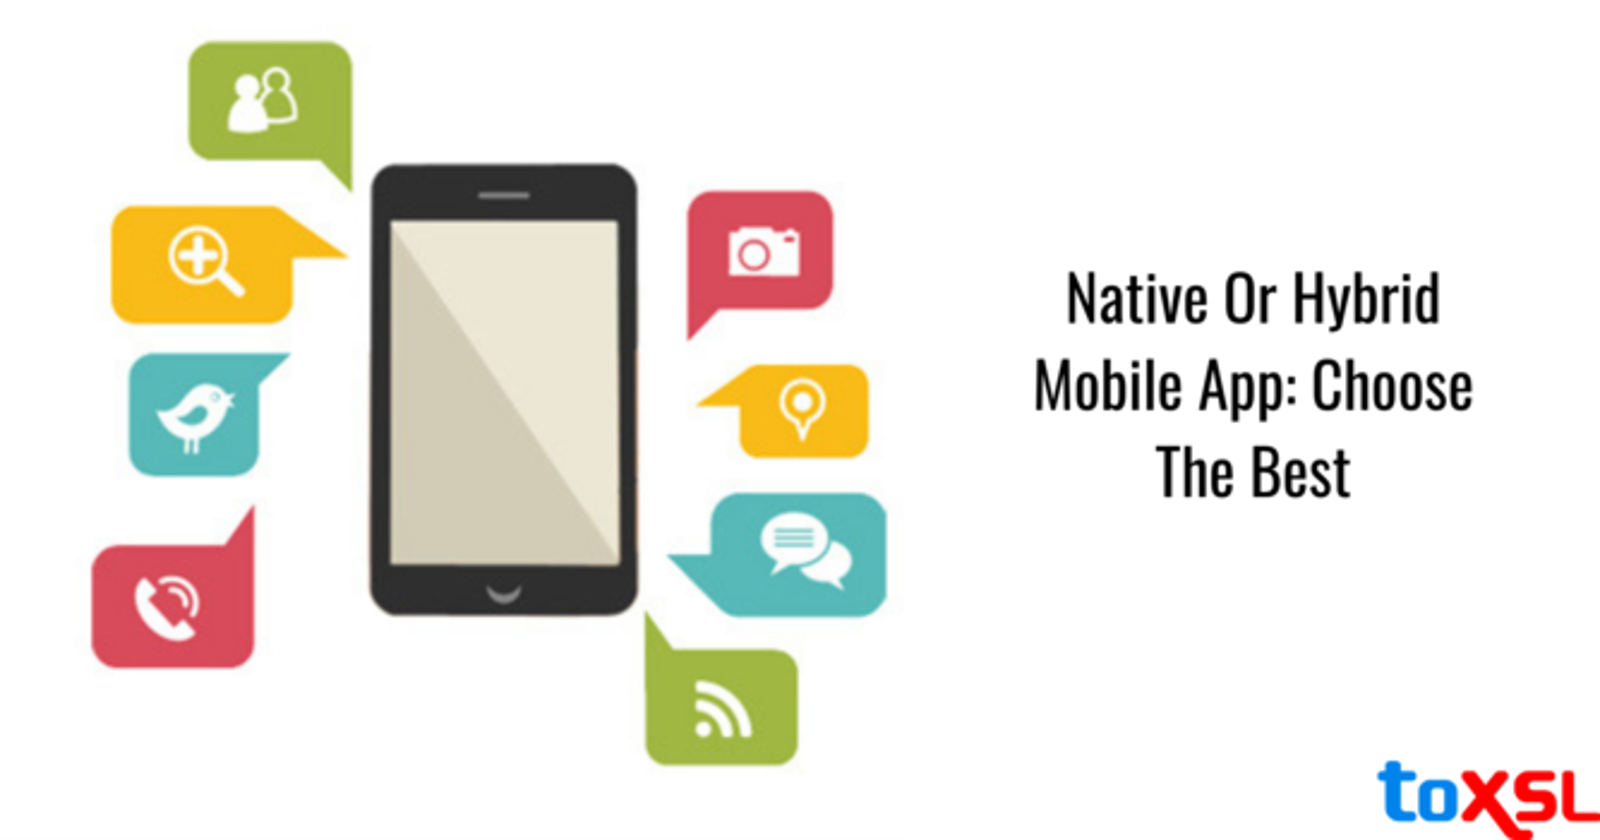 Native Or Hybrid Mobile App: Choose The Best